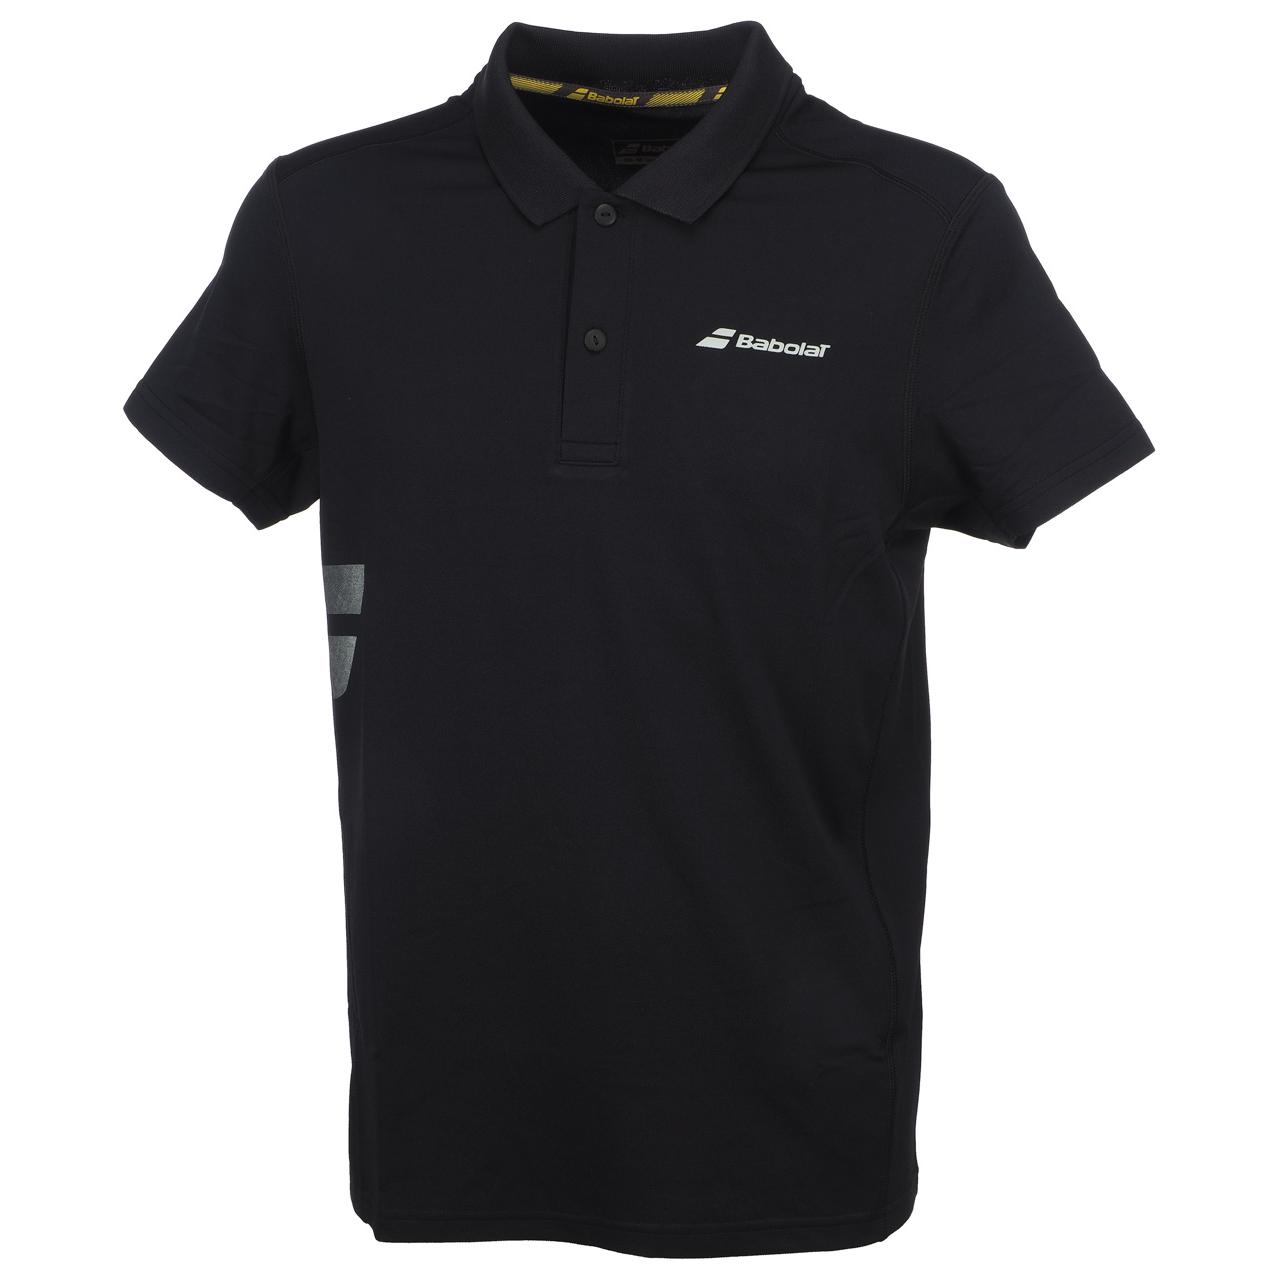 Polo-Tennis-Babolat-Polo-Core-Club-Black-Black-70103-New